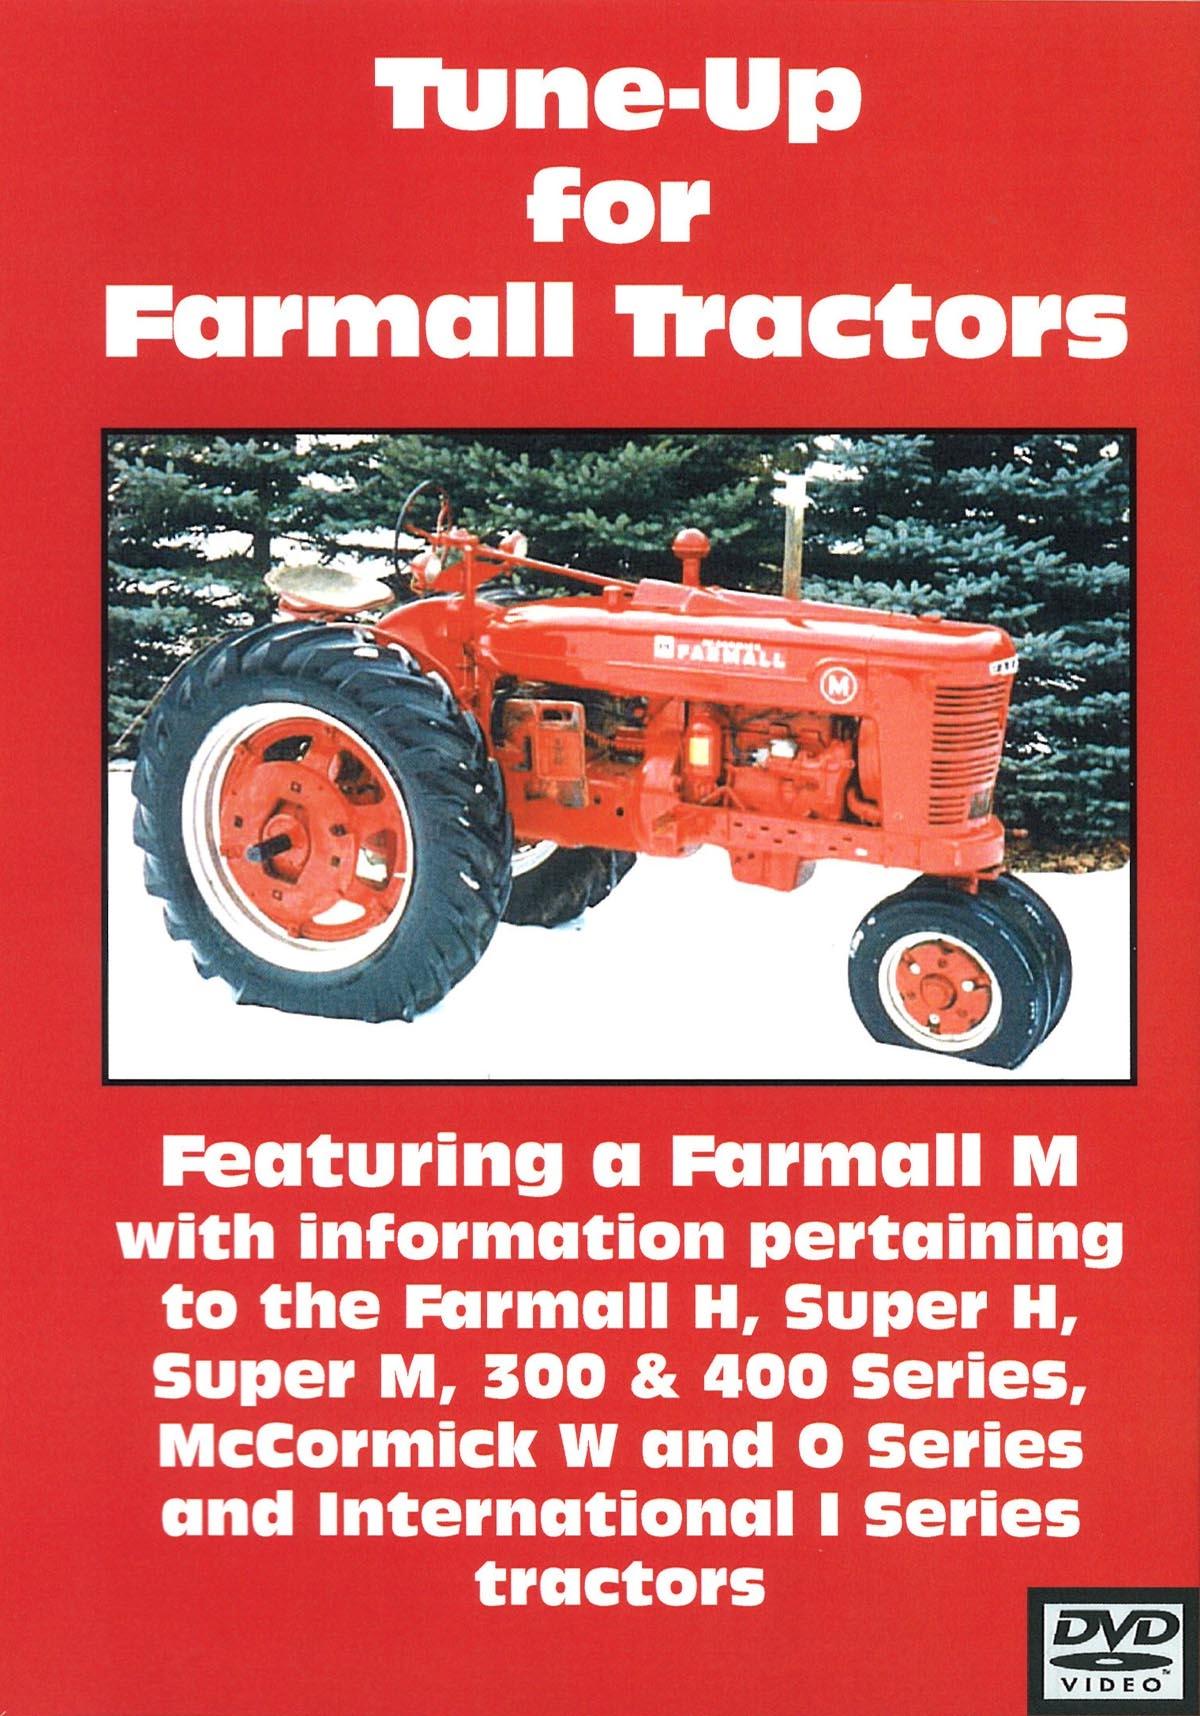 FARMALL H, M, 300, 400 TUNE UP VIDEO (DVD)